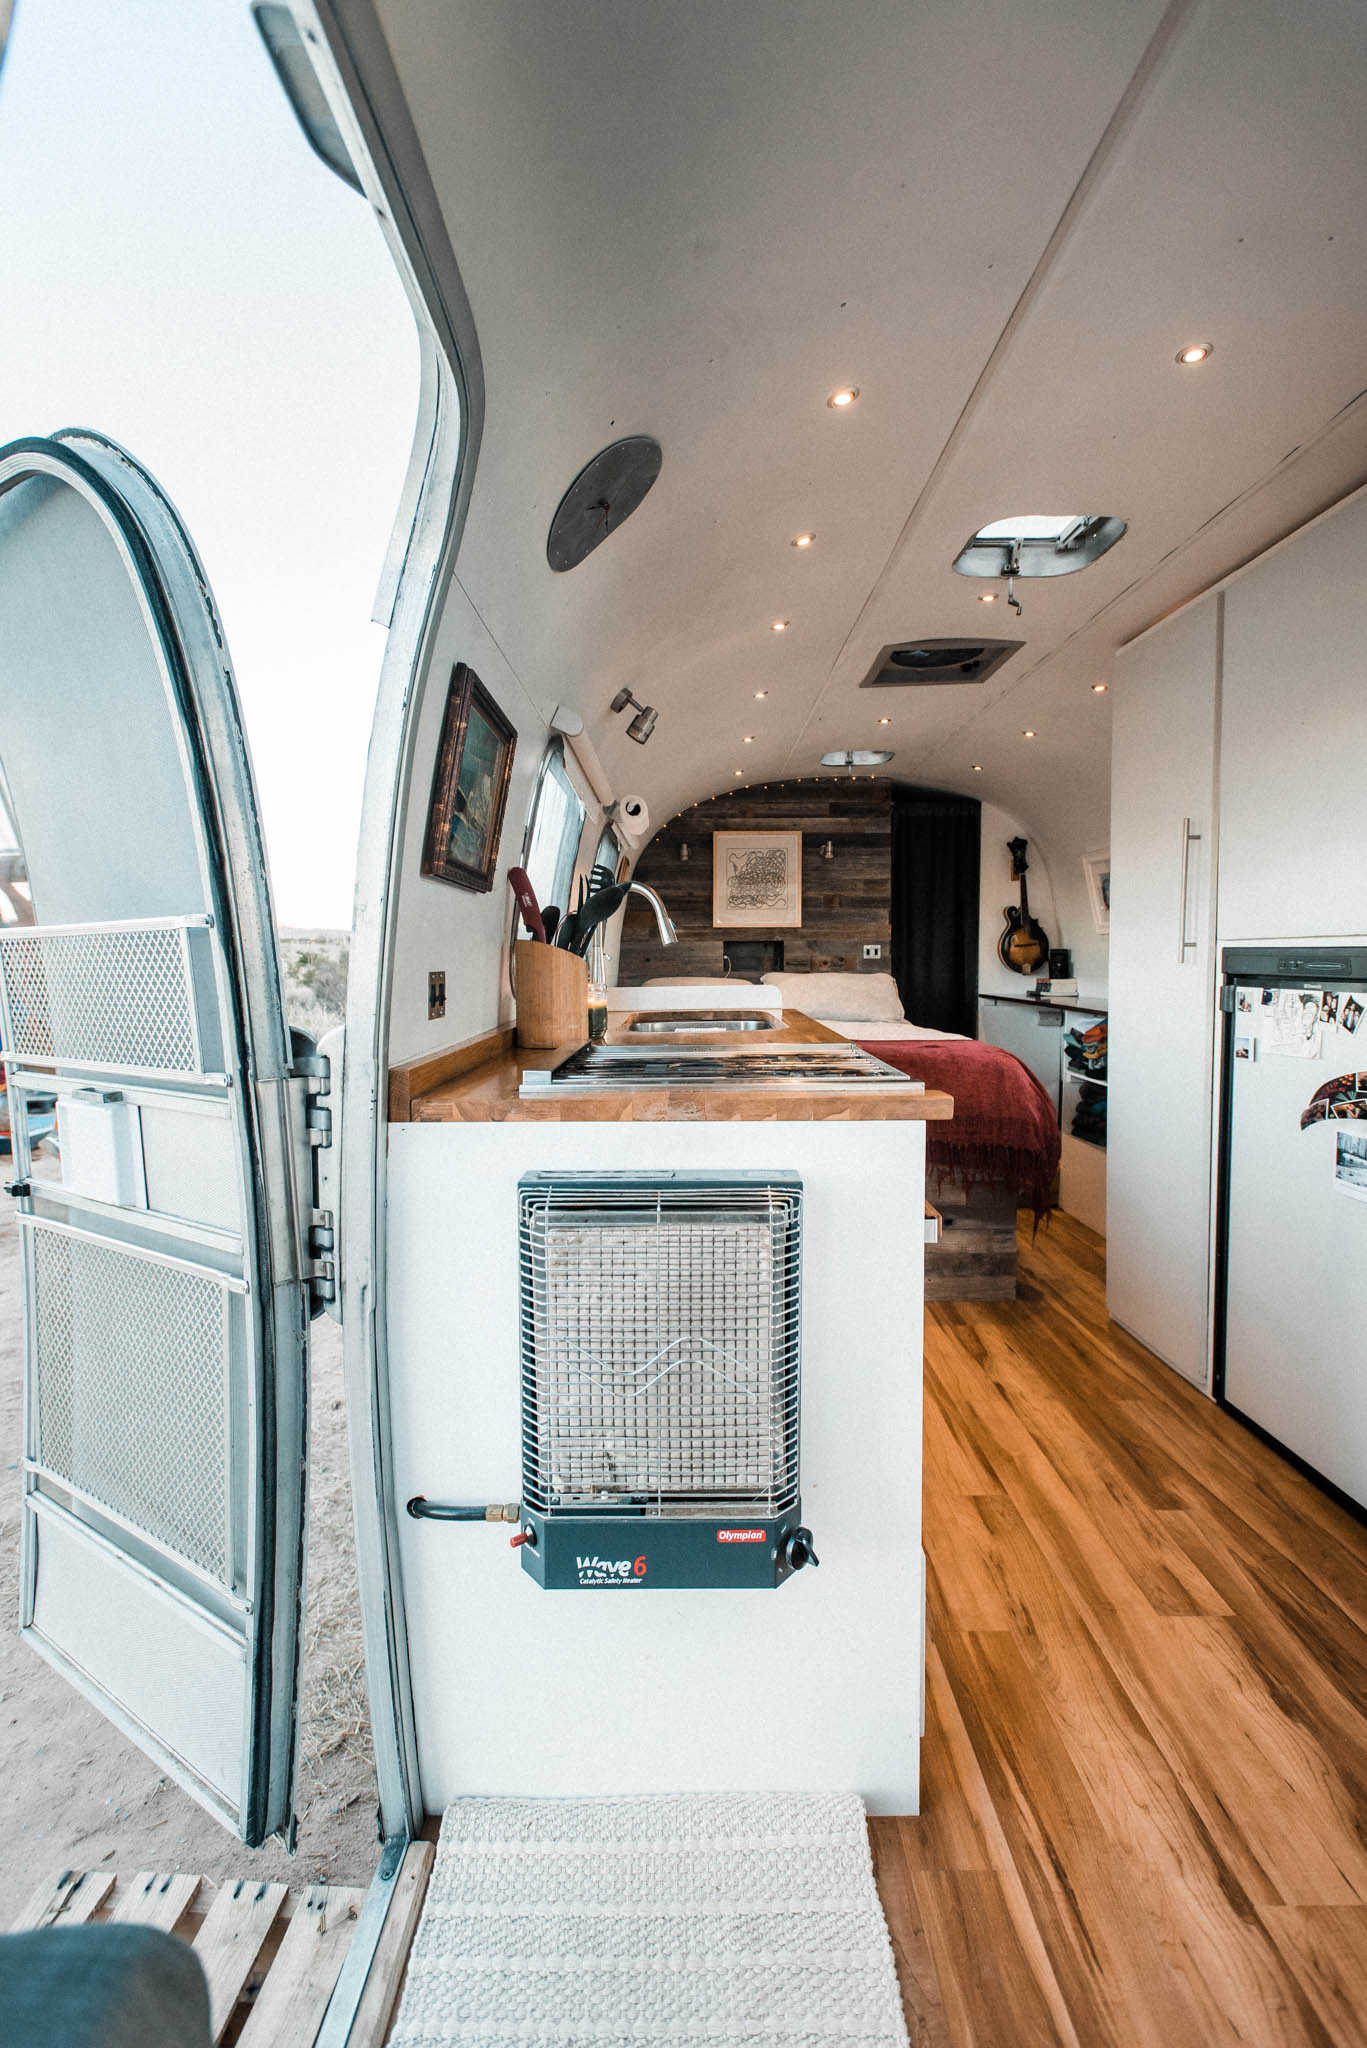 Tiny Home Tour: DIY Remodel of a '72 Airstream Trailer